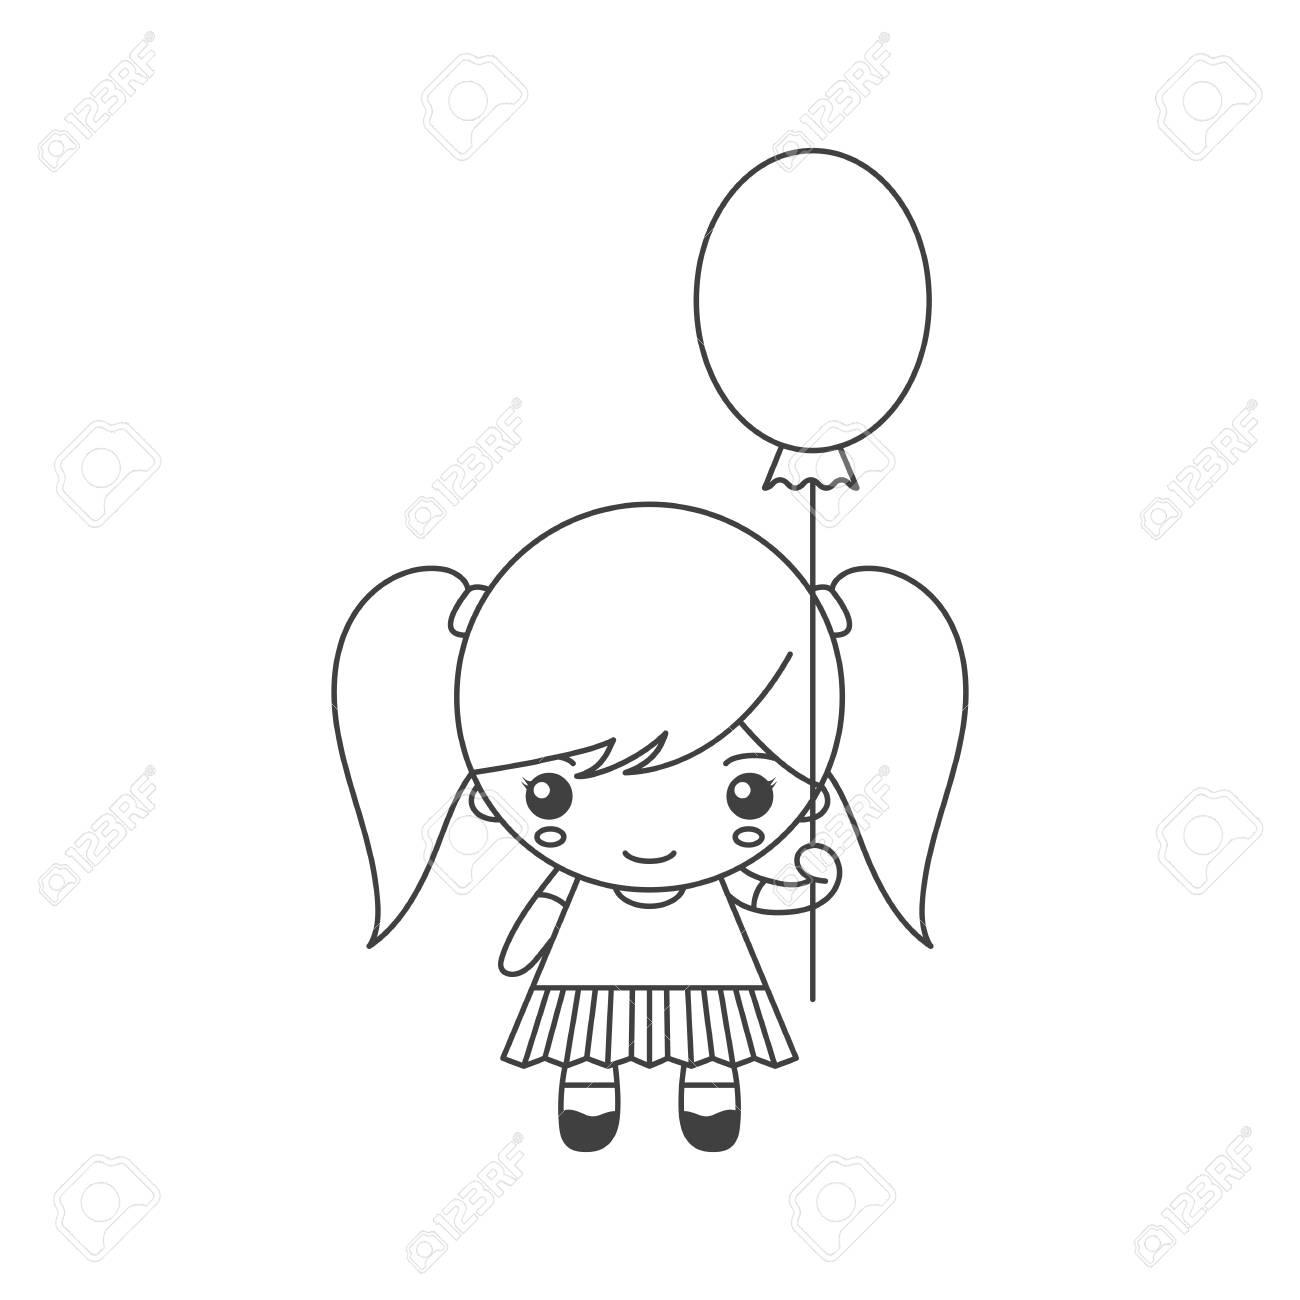 Dessin Animé Mignon Petite Fille Avec Ballon